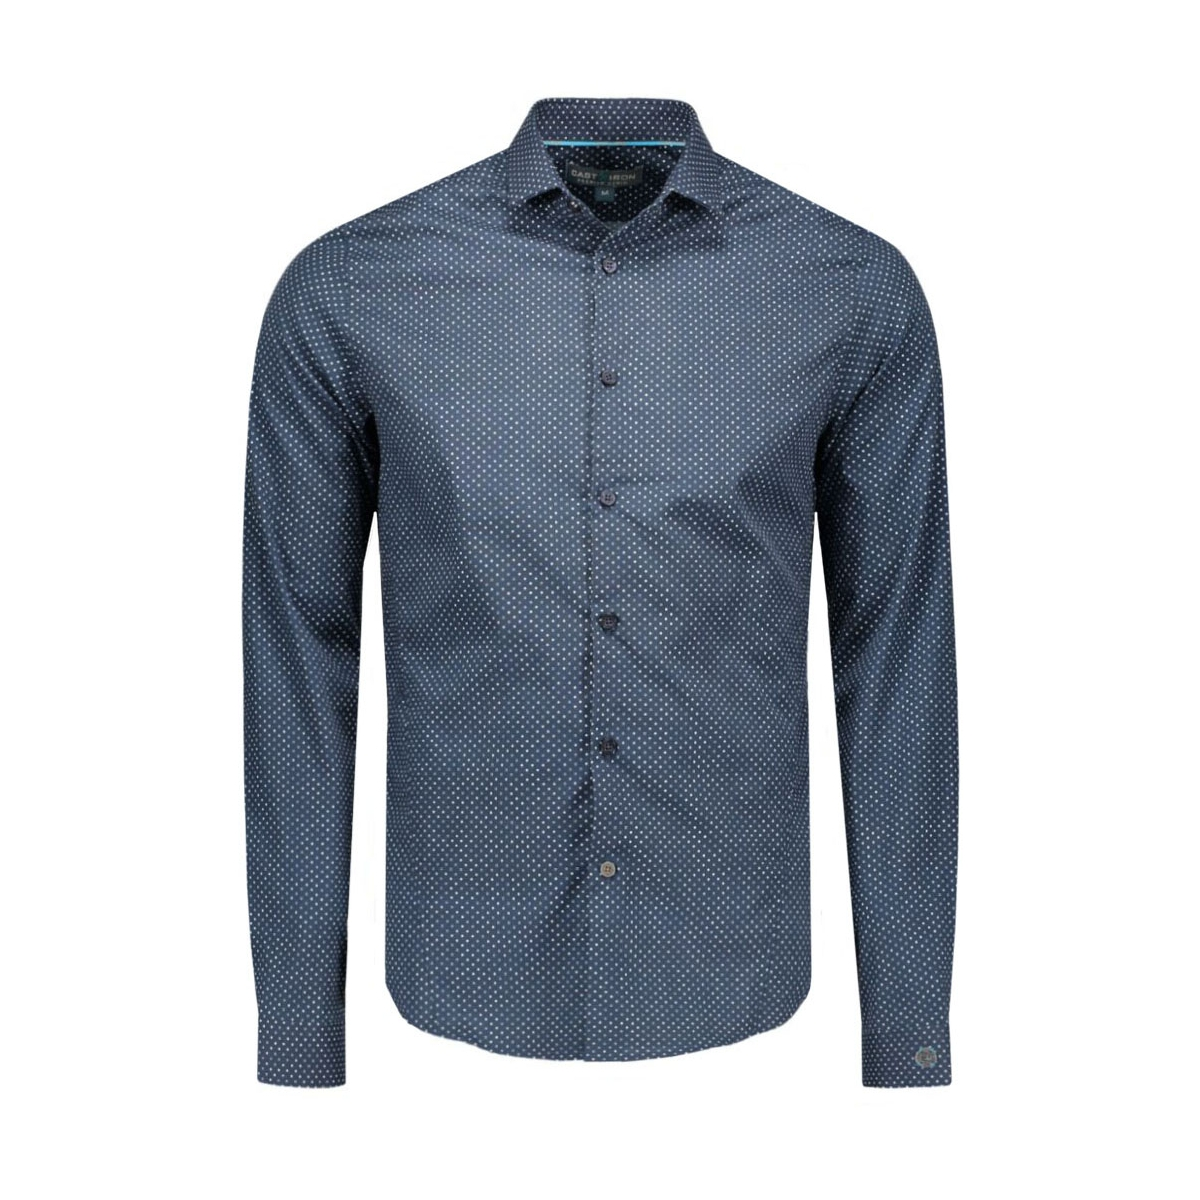 csi65614 cast iron overhemd 5063